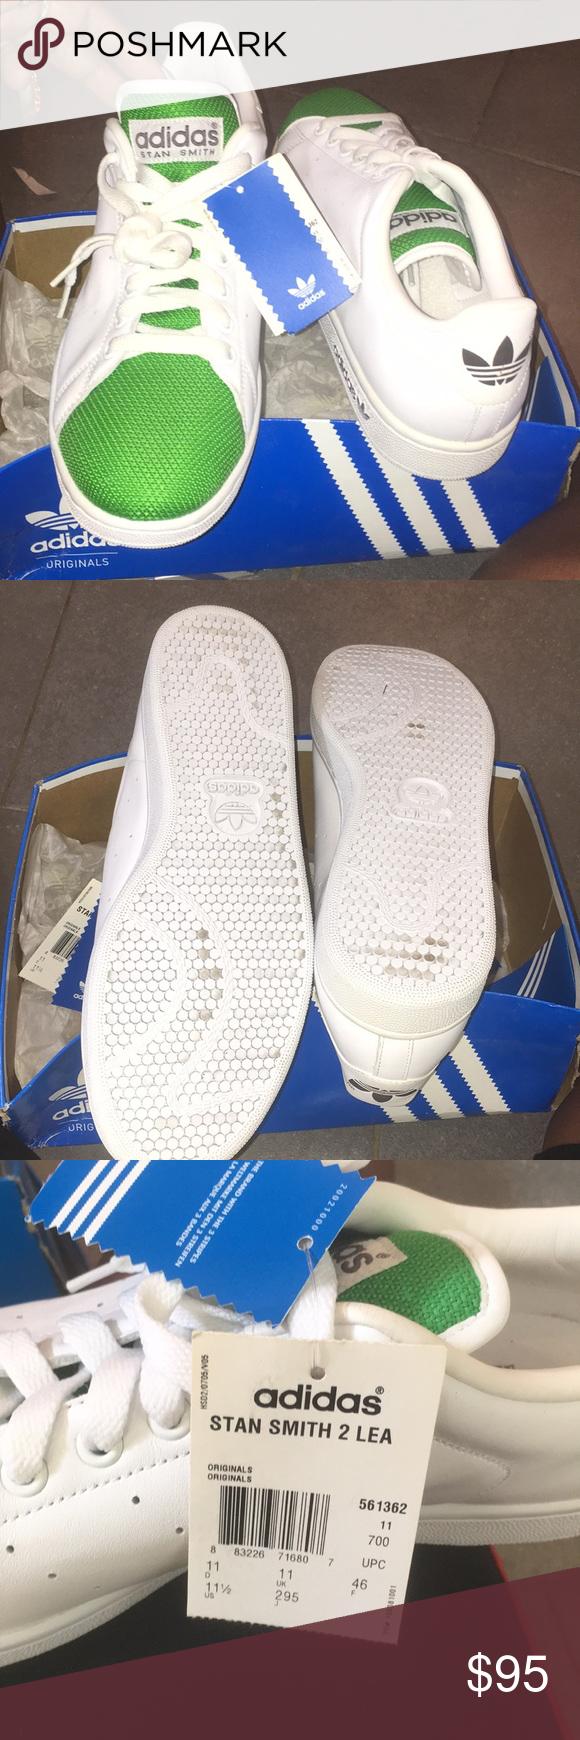 Adidas Sneakers Originals Lea worn Stan still Smith Never lF1T3KJc